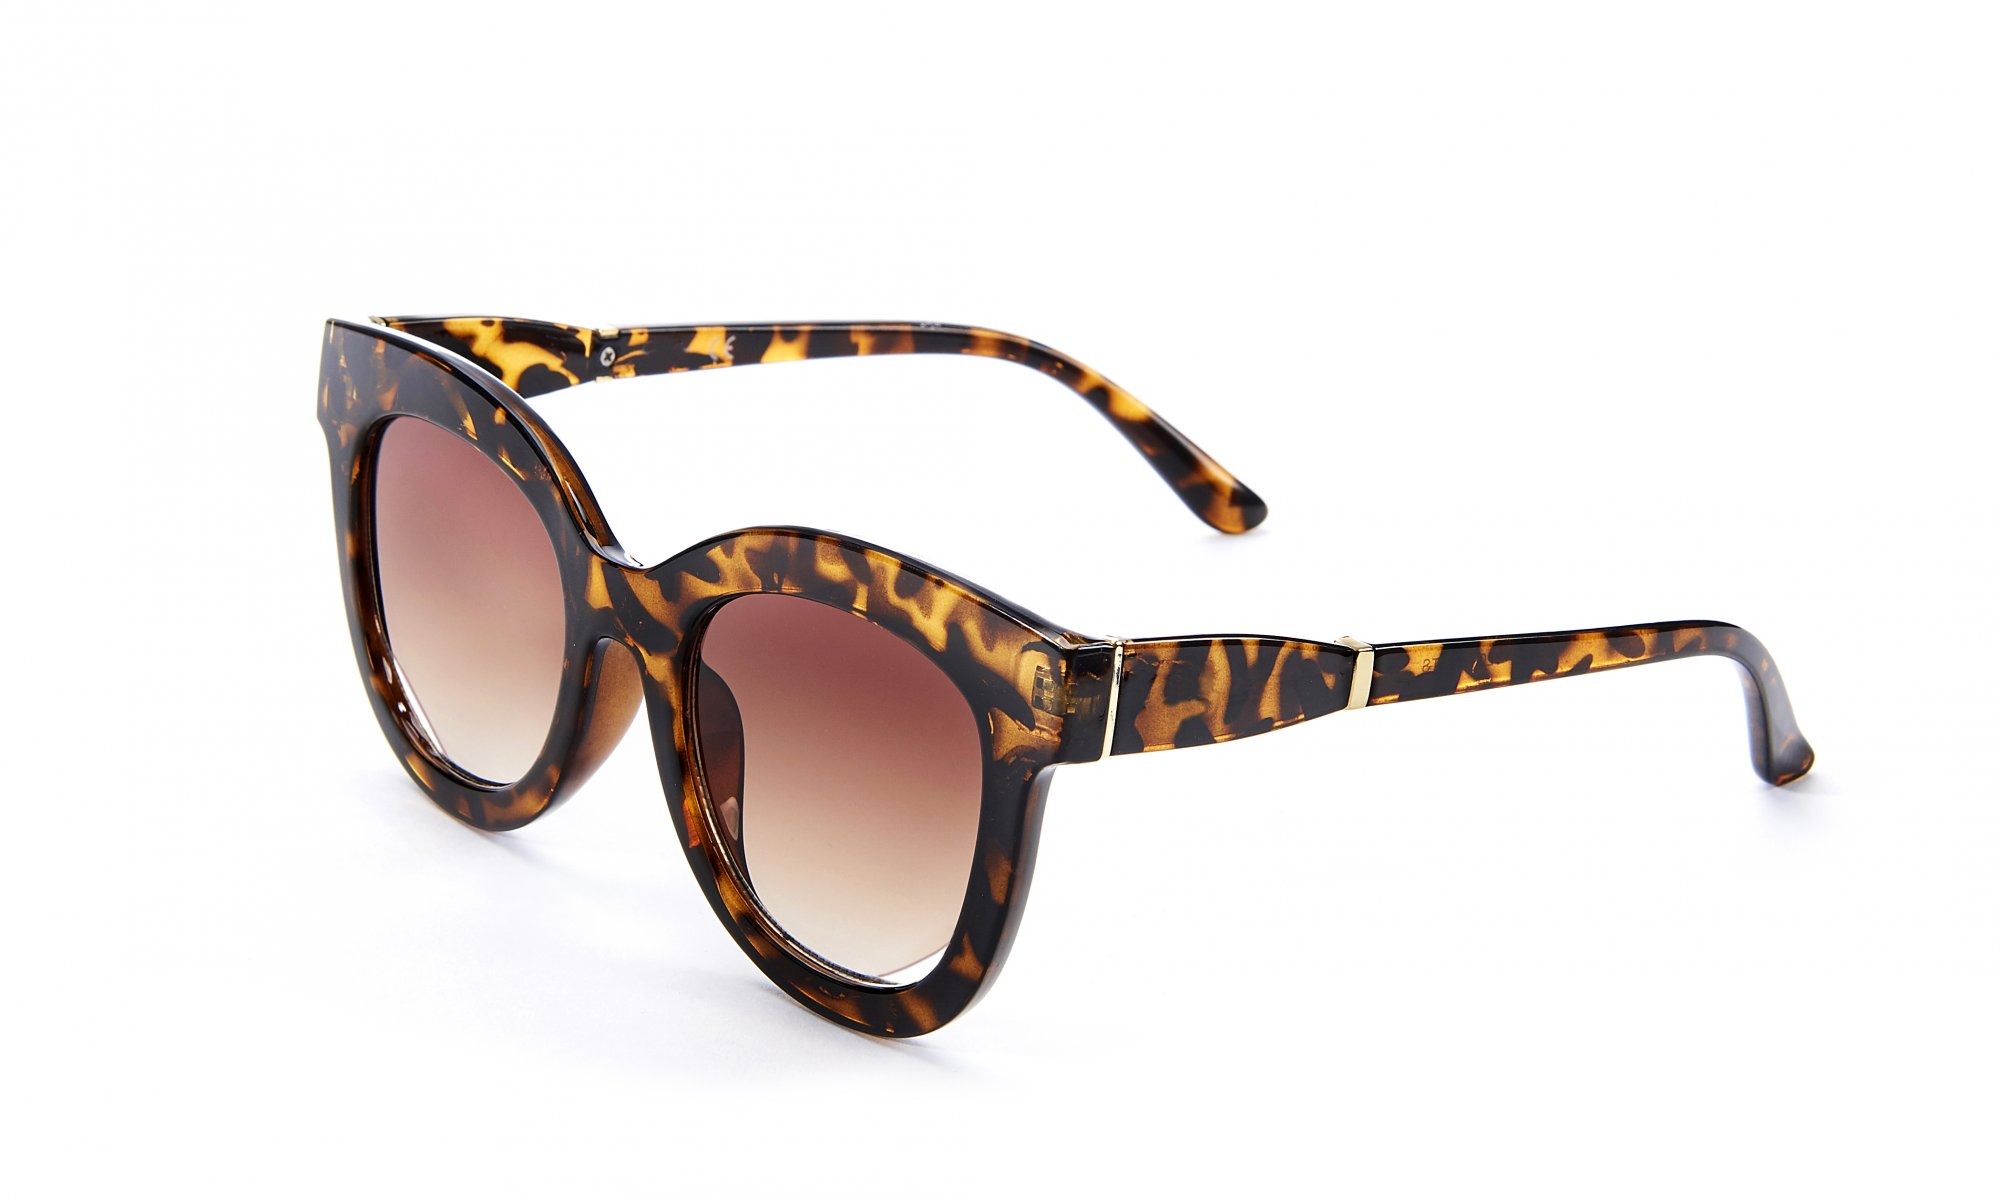 Tortoise Sunglasses Case & Coth